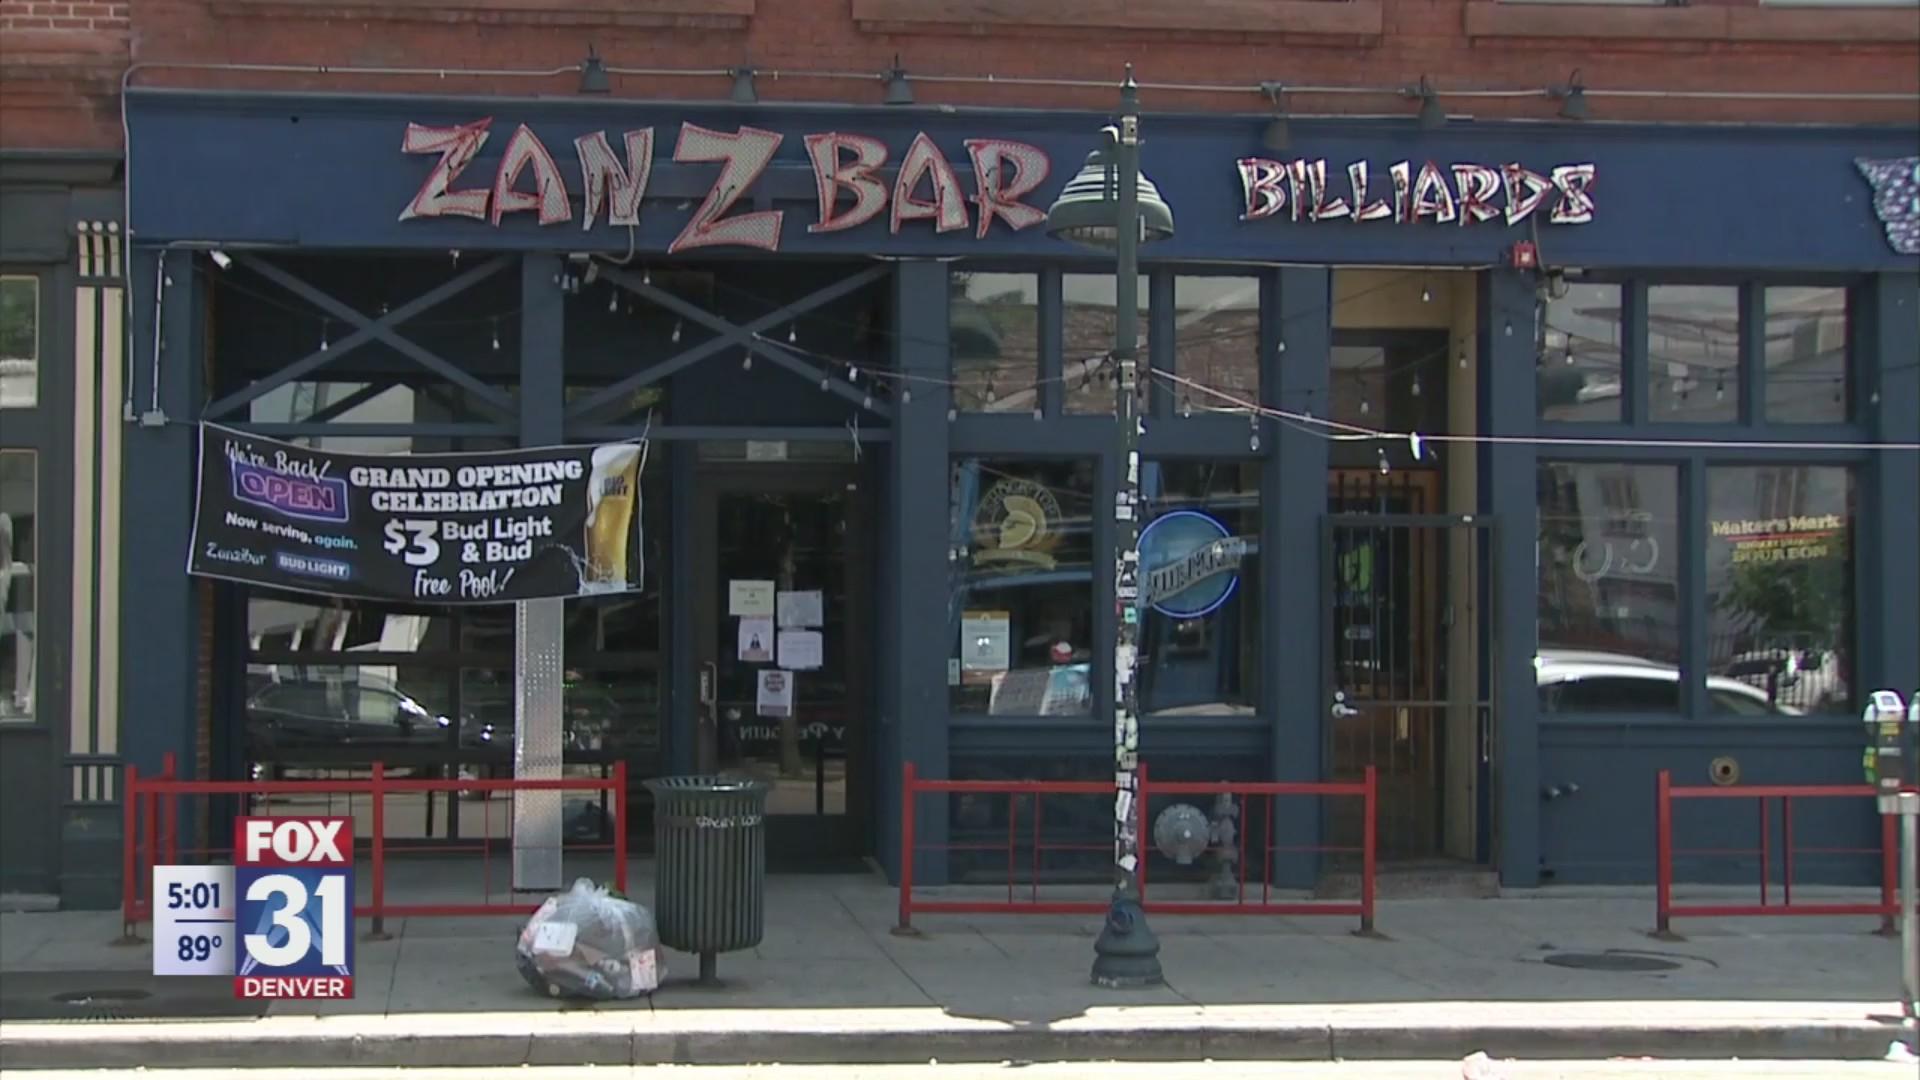 Denver businesses cited for COVID-19 violations